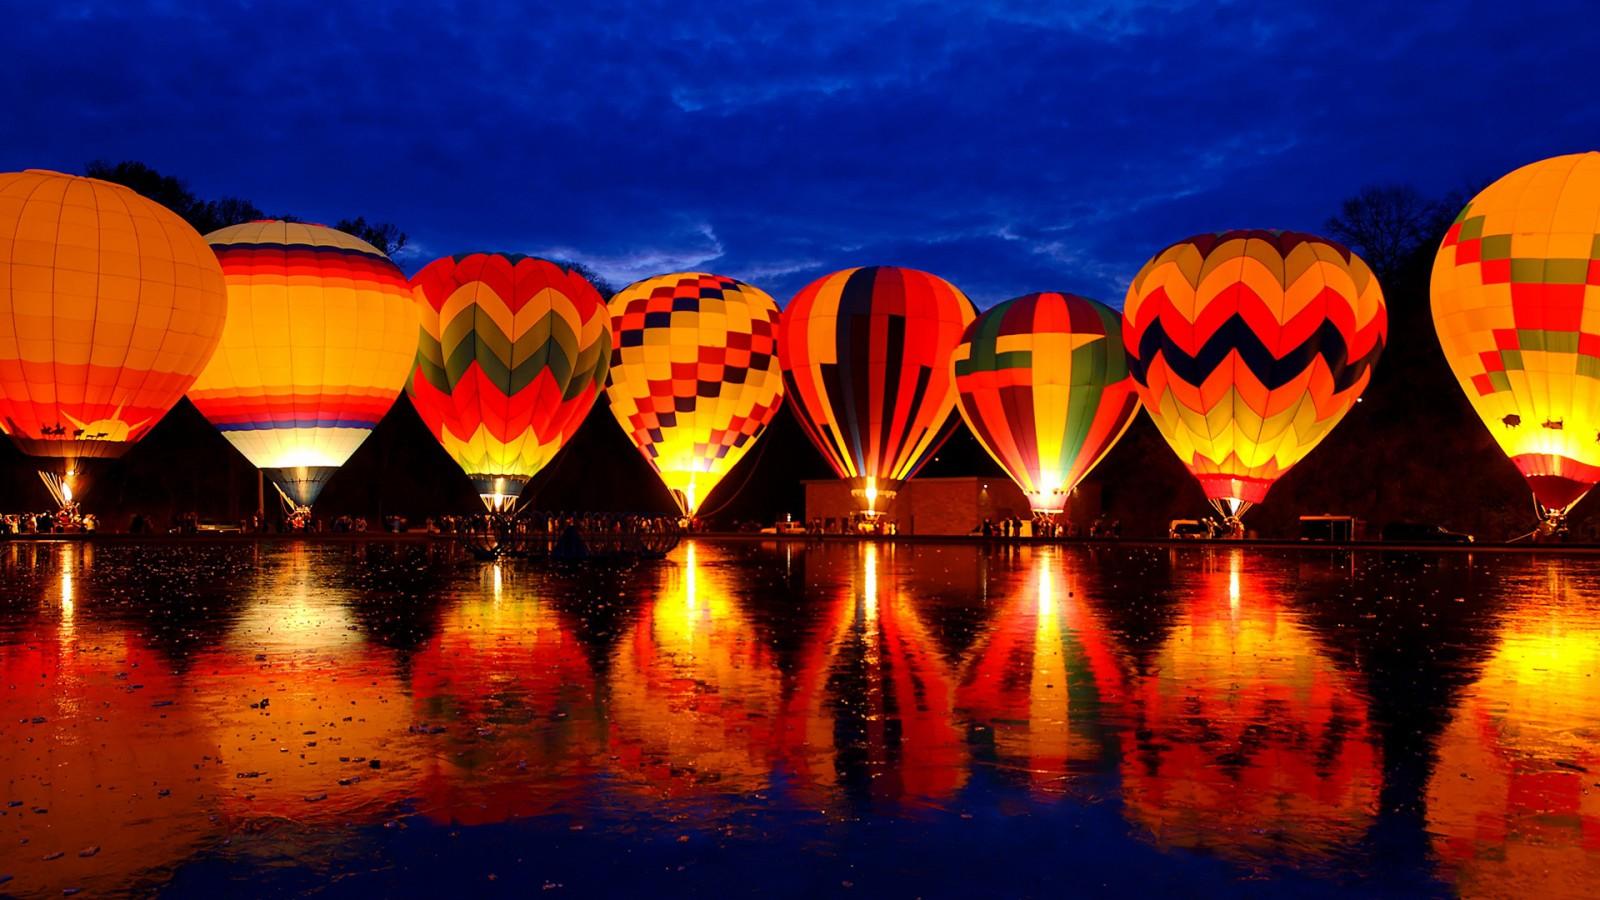 Balluminaria Hot Air Balloon Glow Festival Wallpapers Hd Wallpapers Id 13839